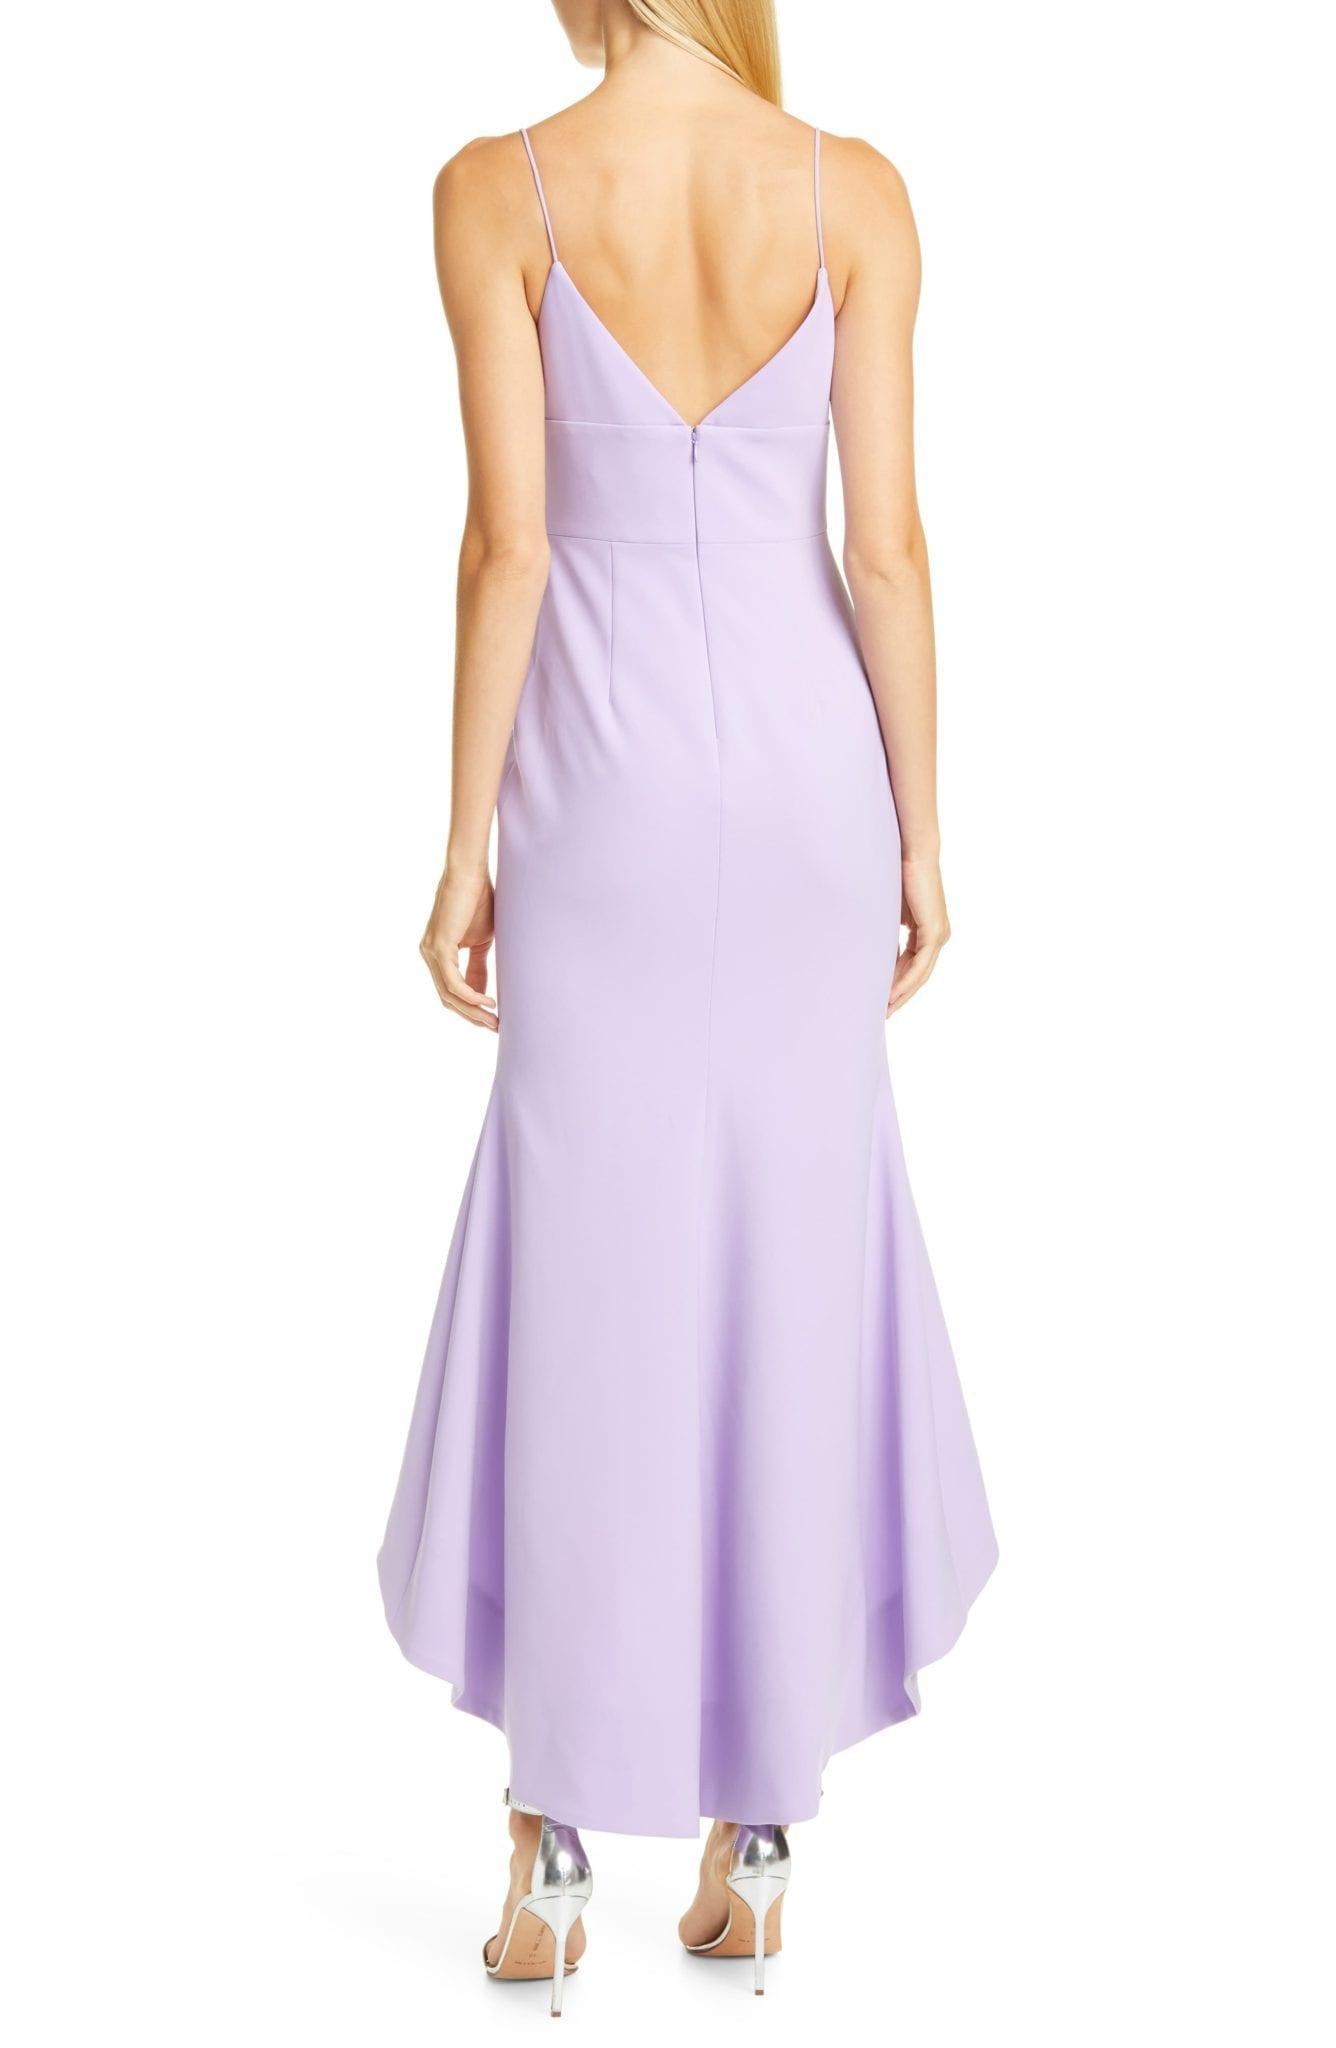 CHRISTIAN SIRIANO V-Neck High Low Slip Dress